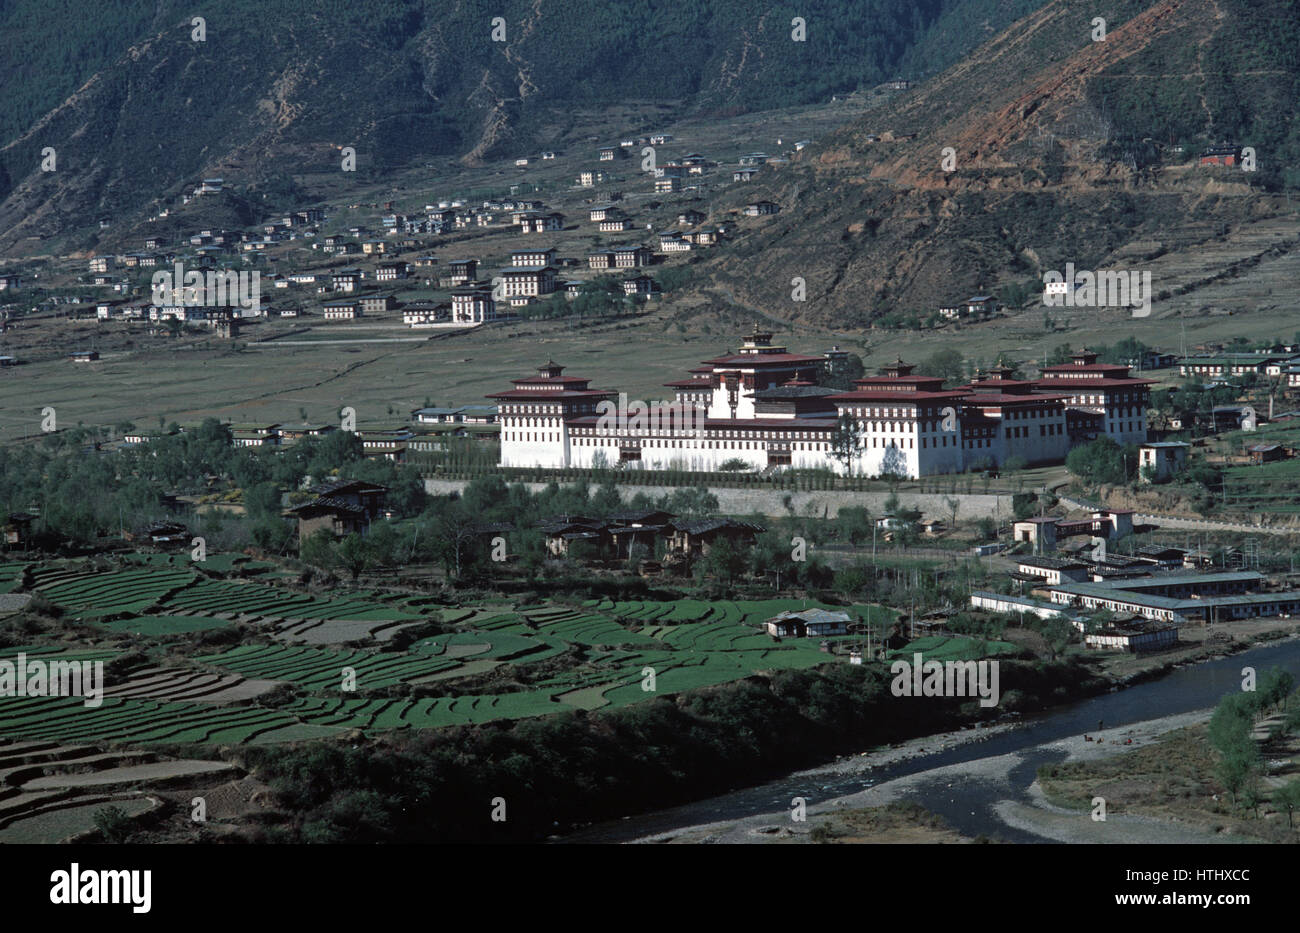 Tashichhodzong, monastère bouddhiste et siège du gouvernement, Thimphu, Bhoutan, Himalaya Photo Stock